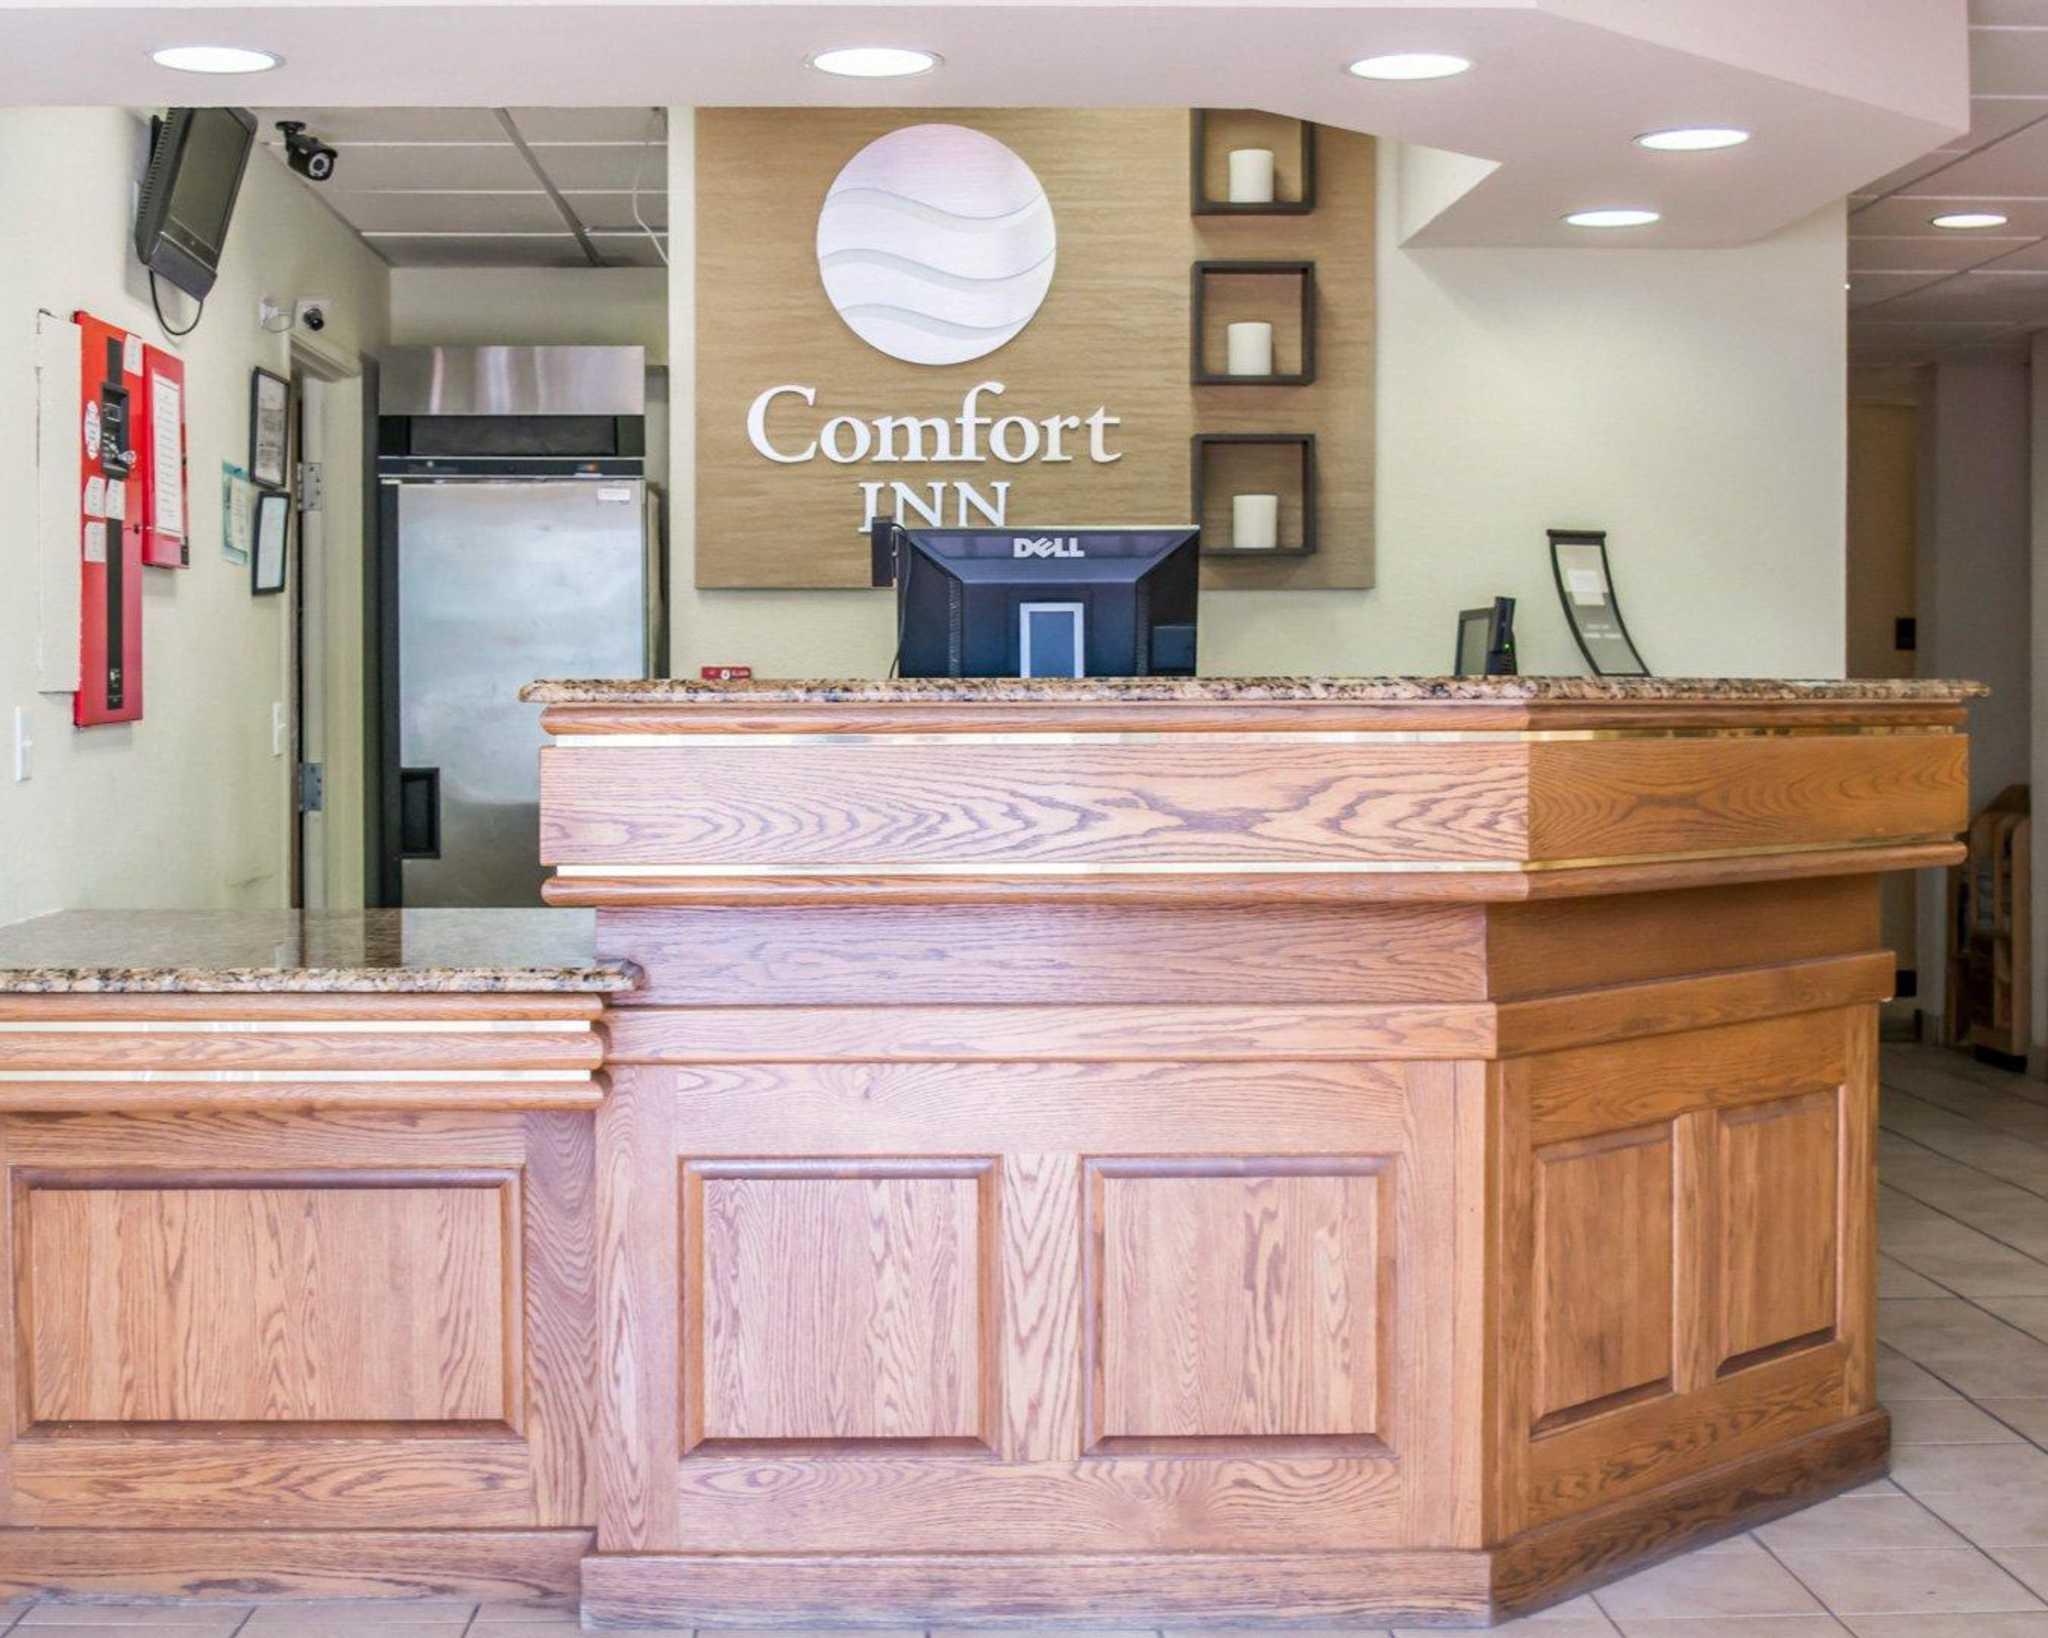 Comfort Inn Fort Myers Northeast image 15